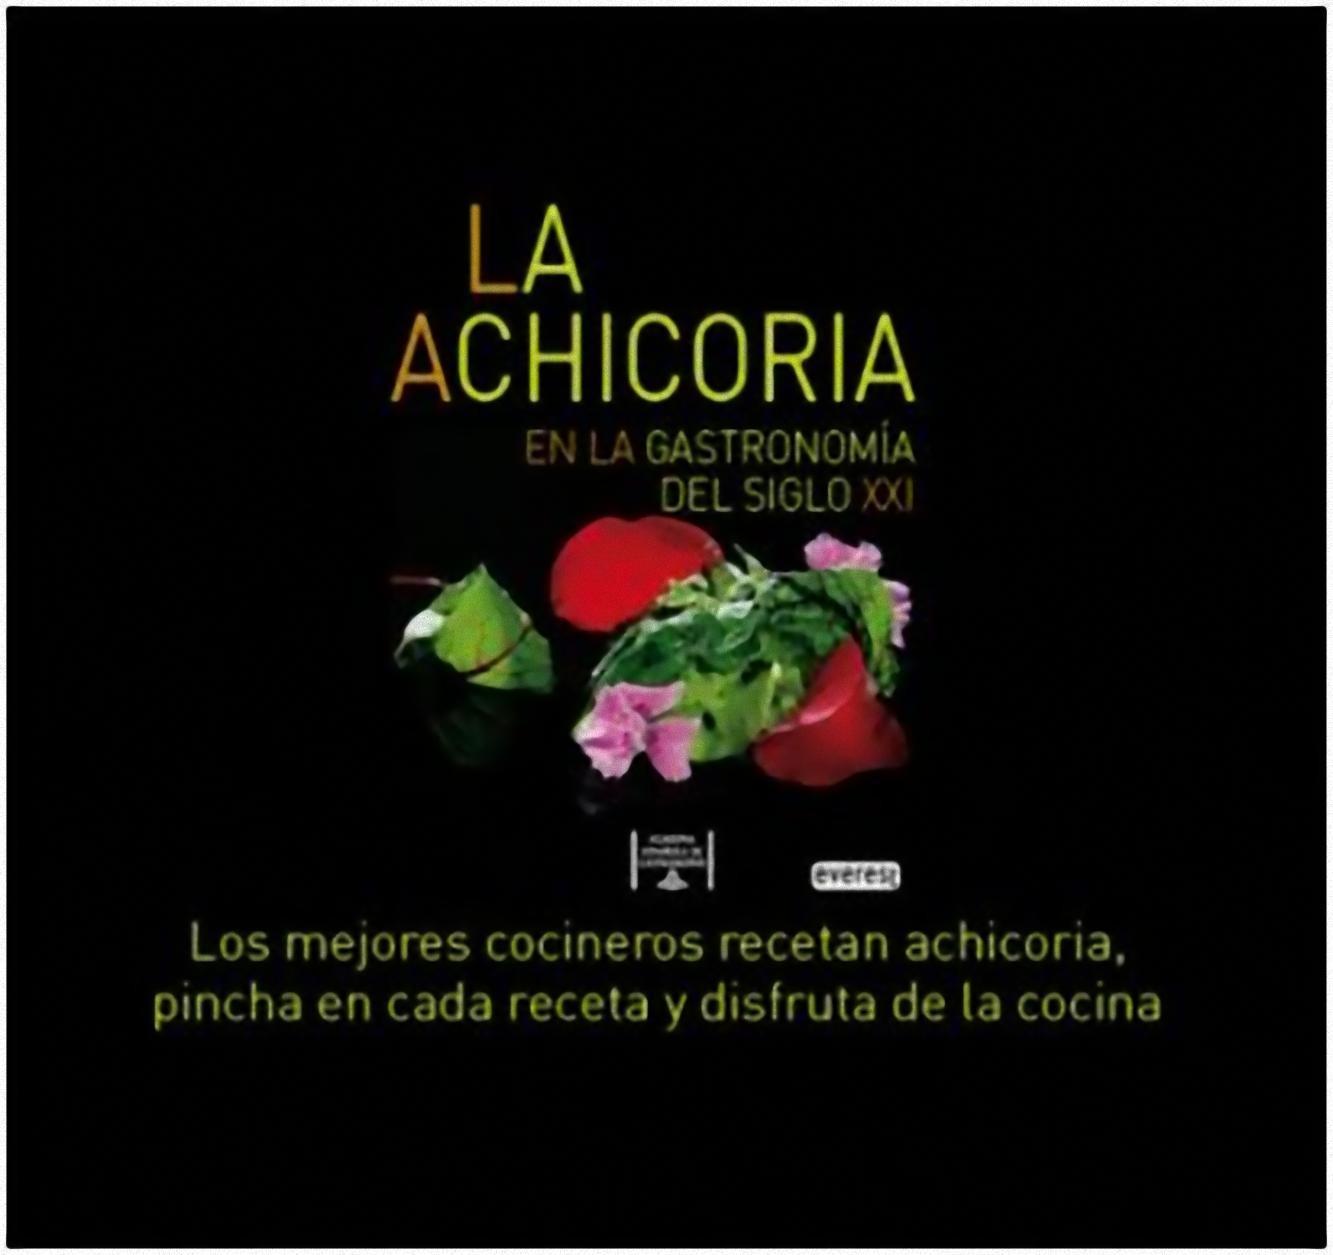 La Achicoria en la Gastronomía del Siglo XXI